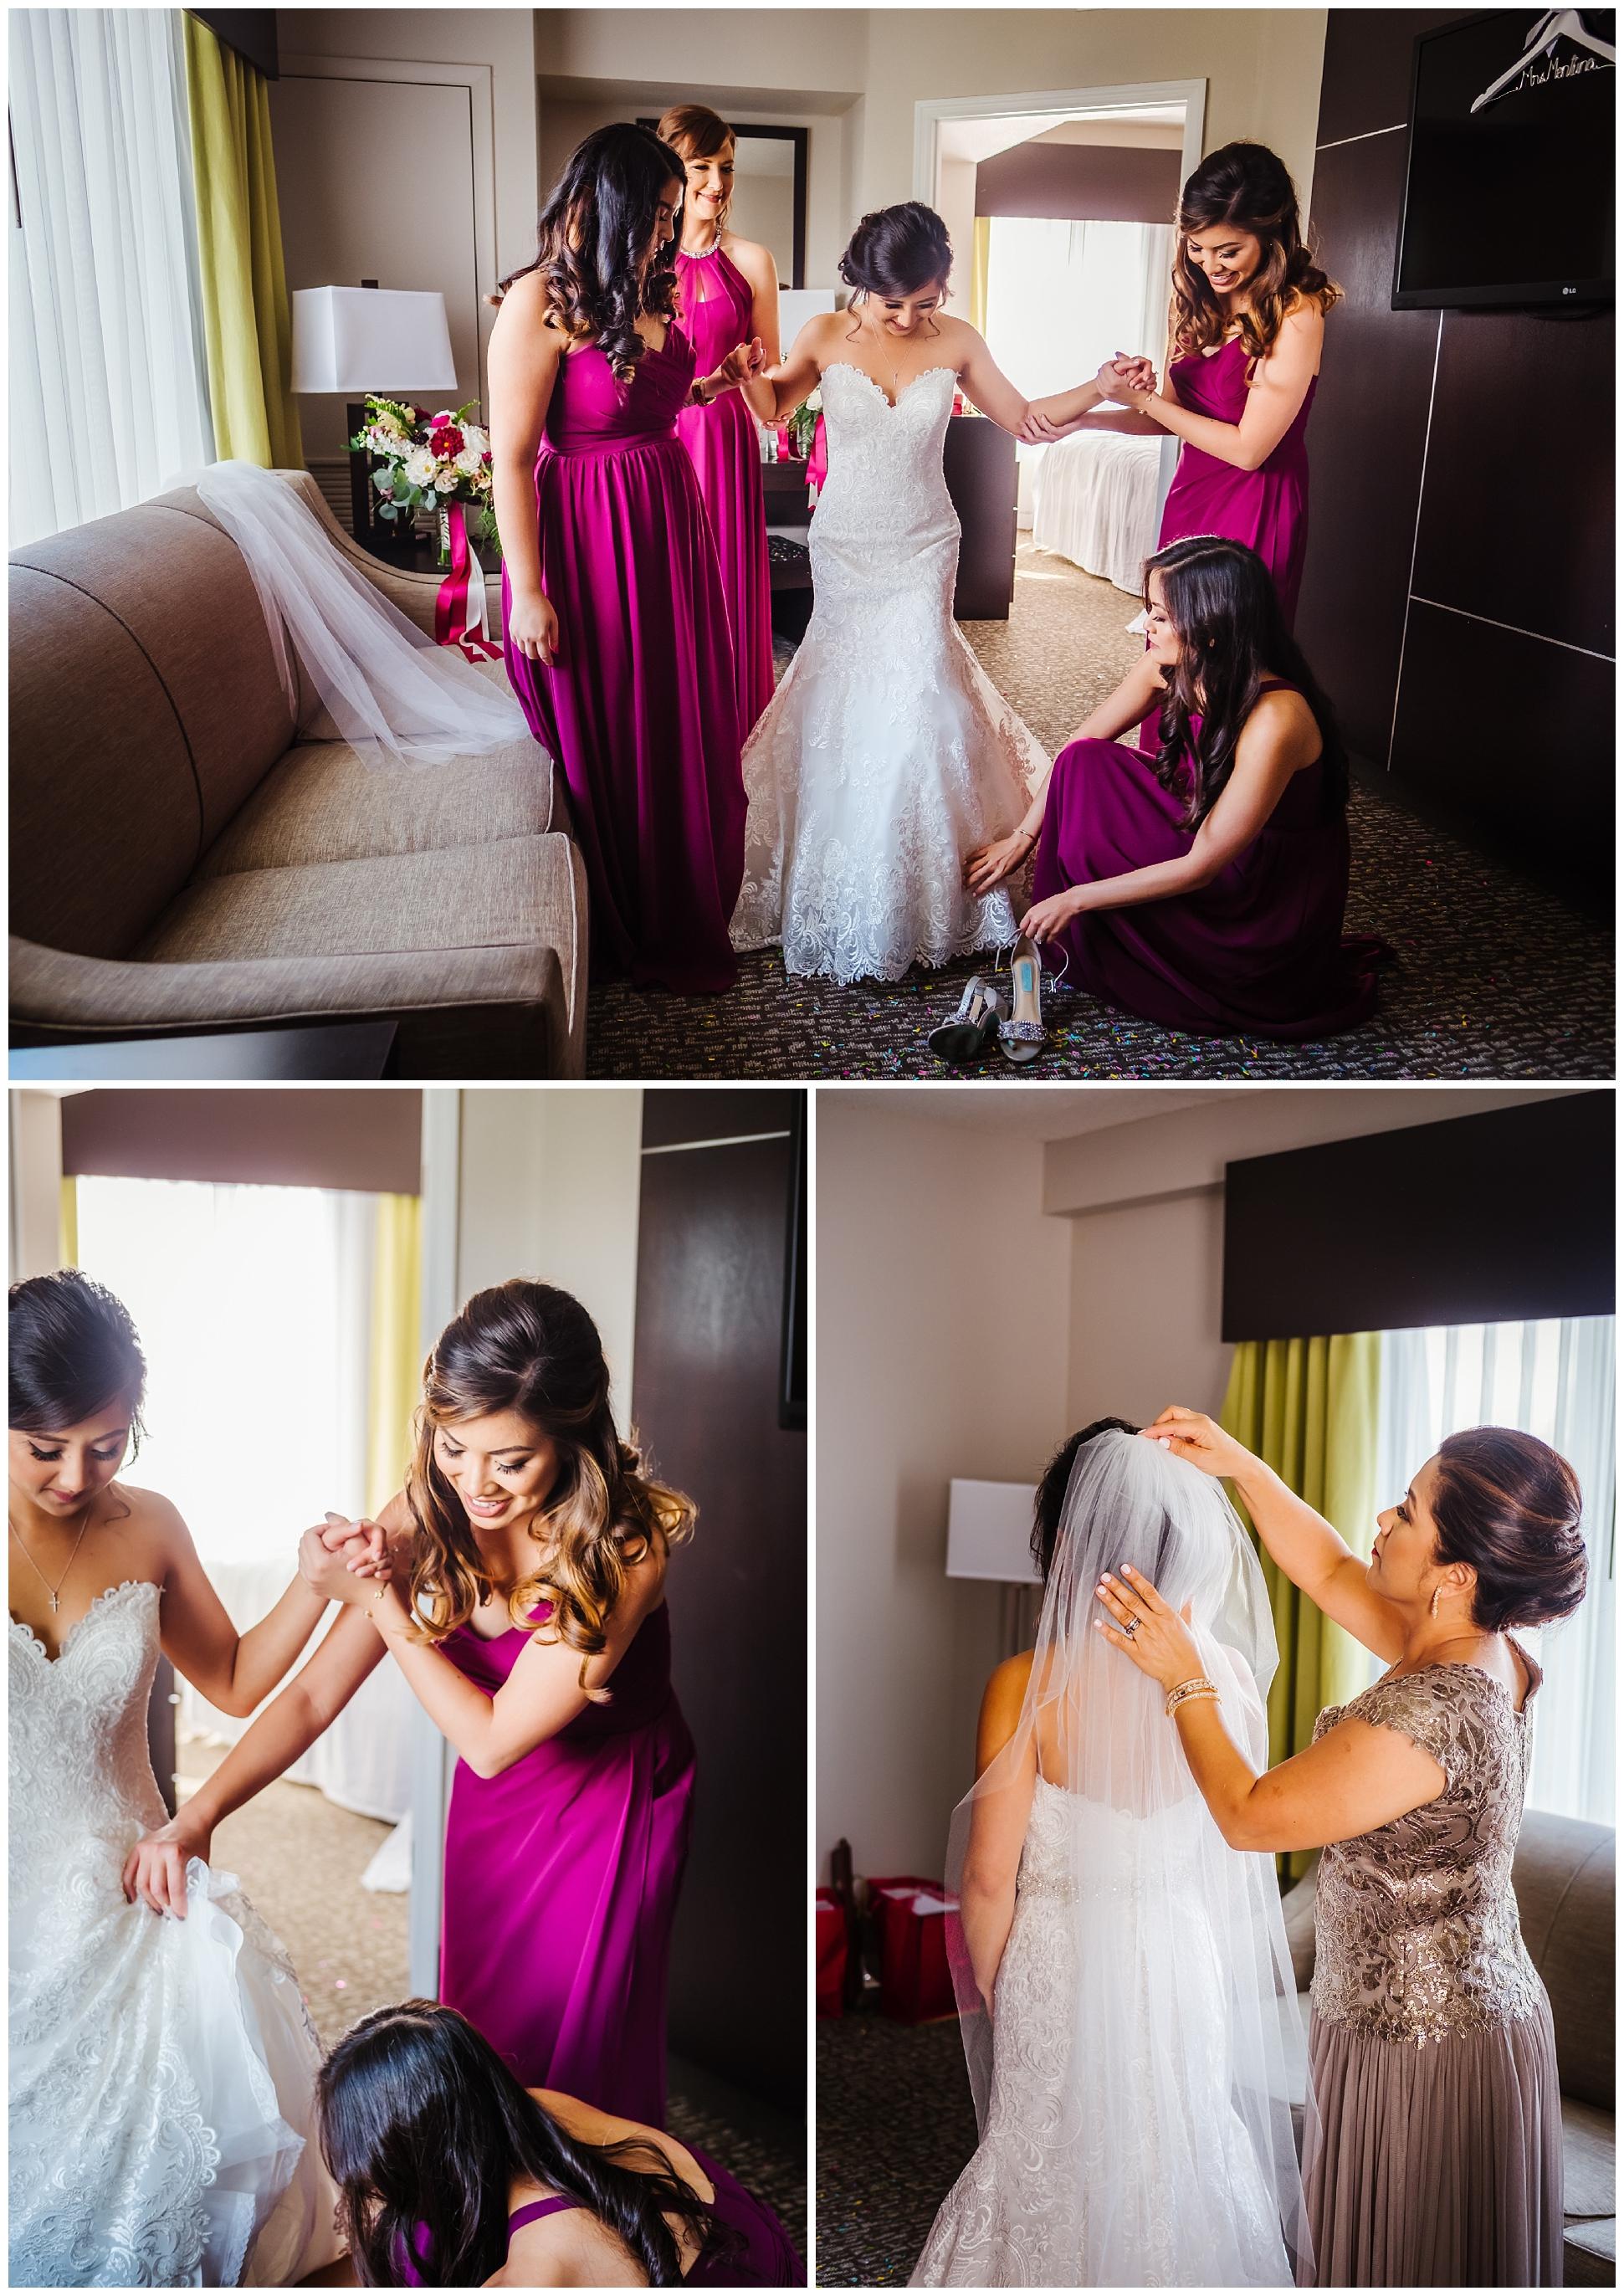 tampa-wedding-photographer-philipino-colorful-woods-ballroom-church-mass-confetti-fuscia_0015.jpg